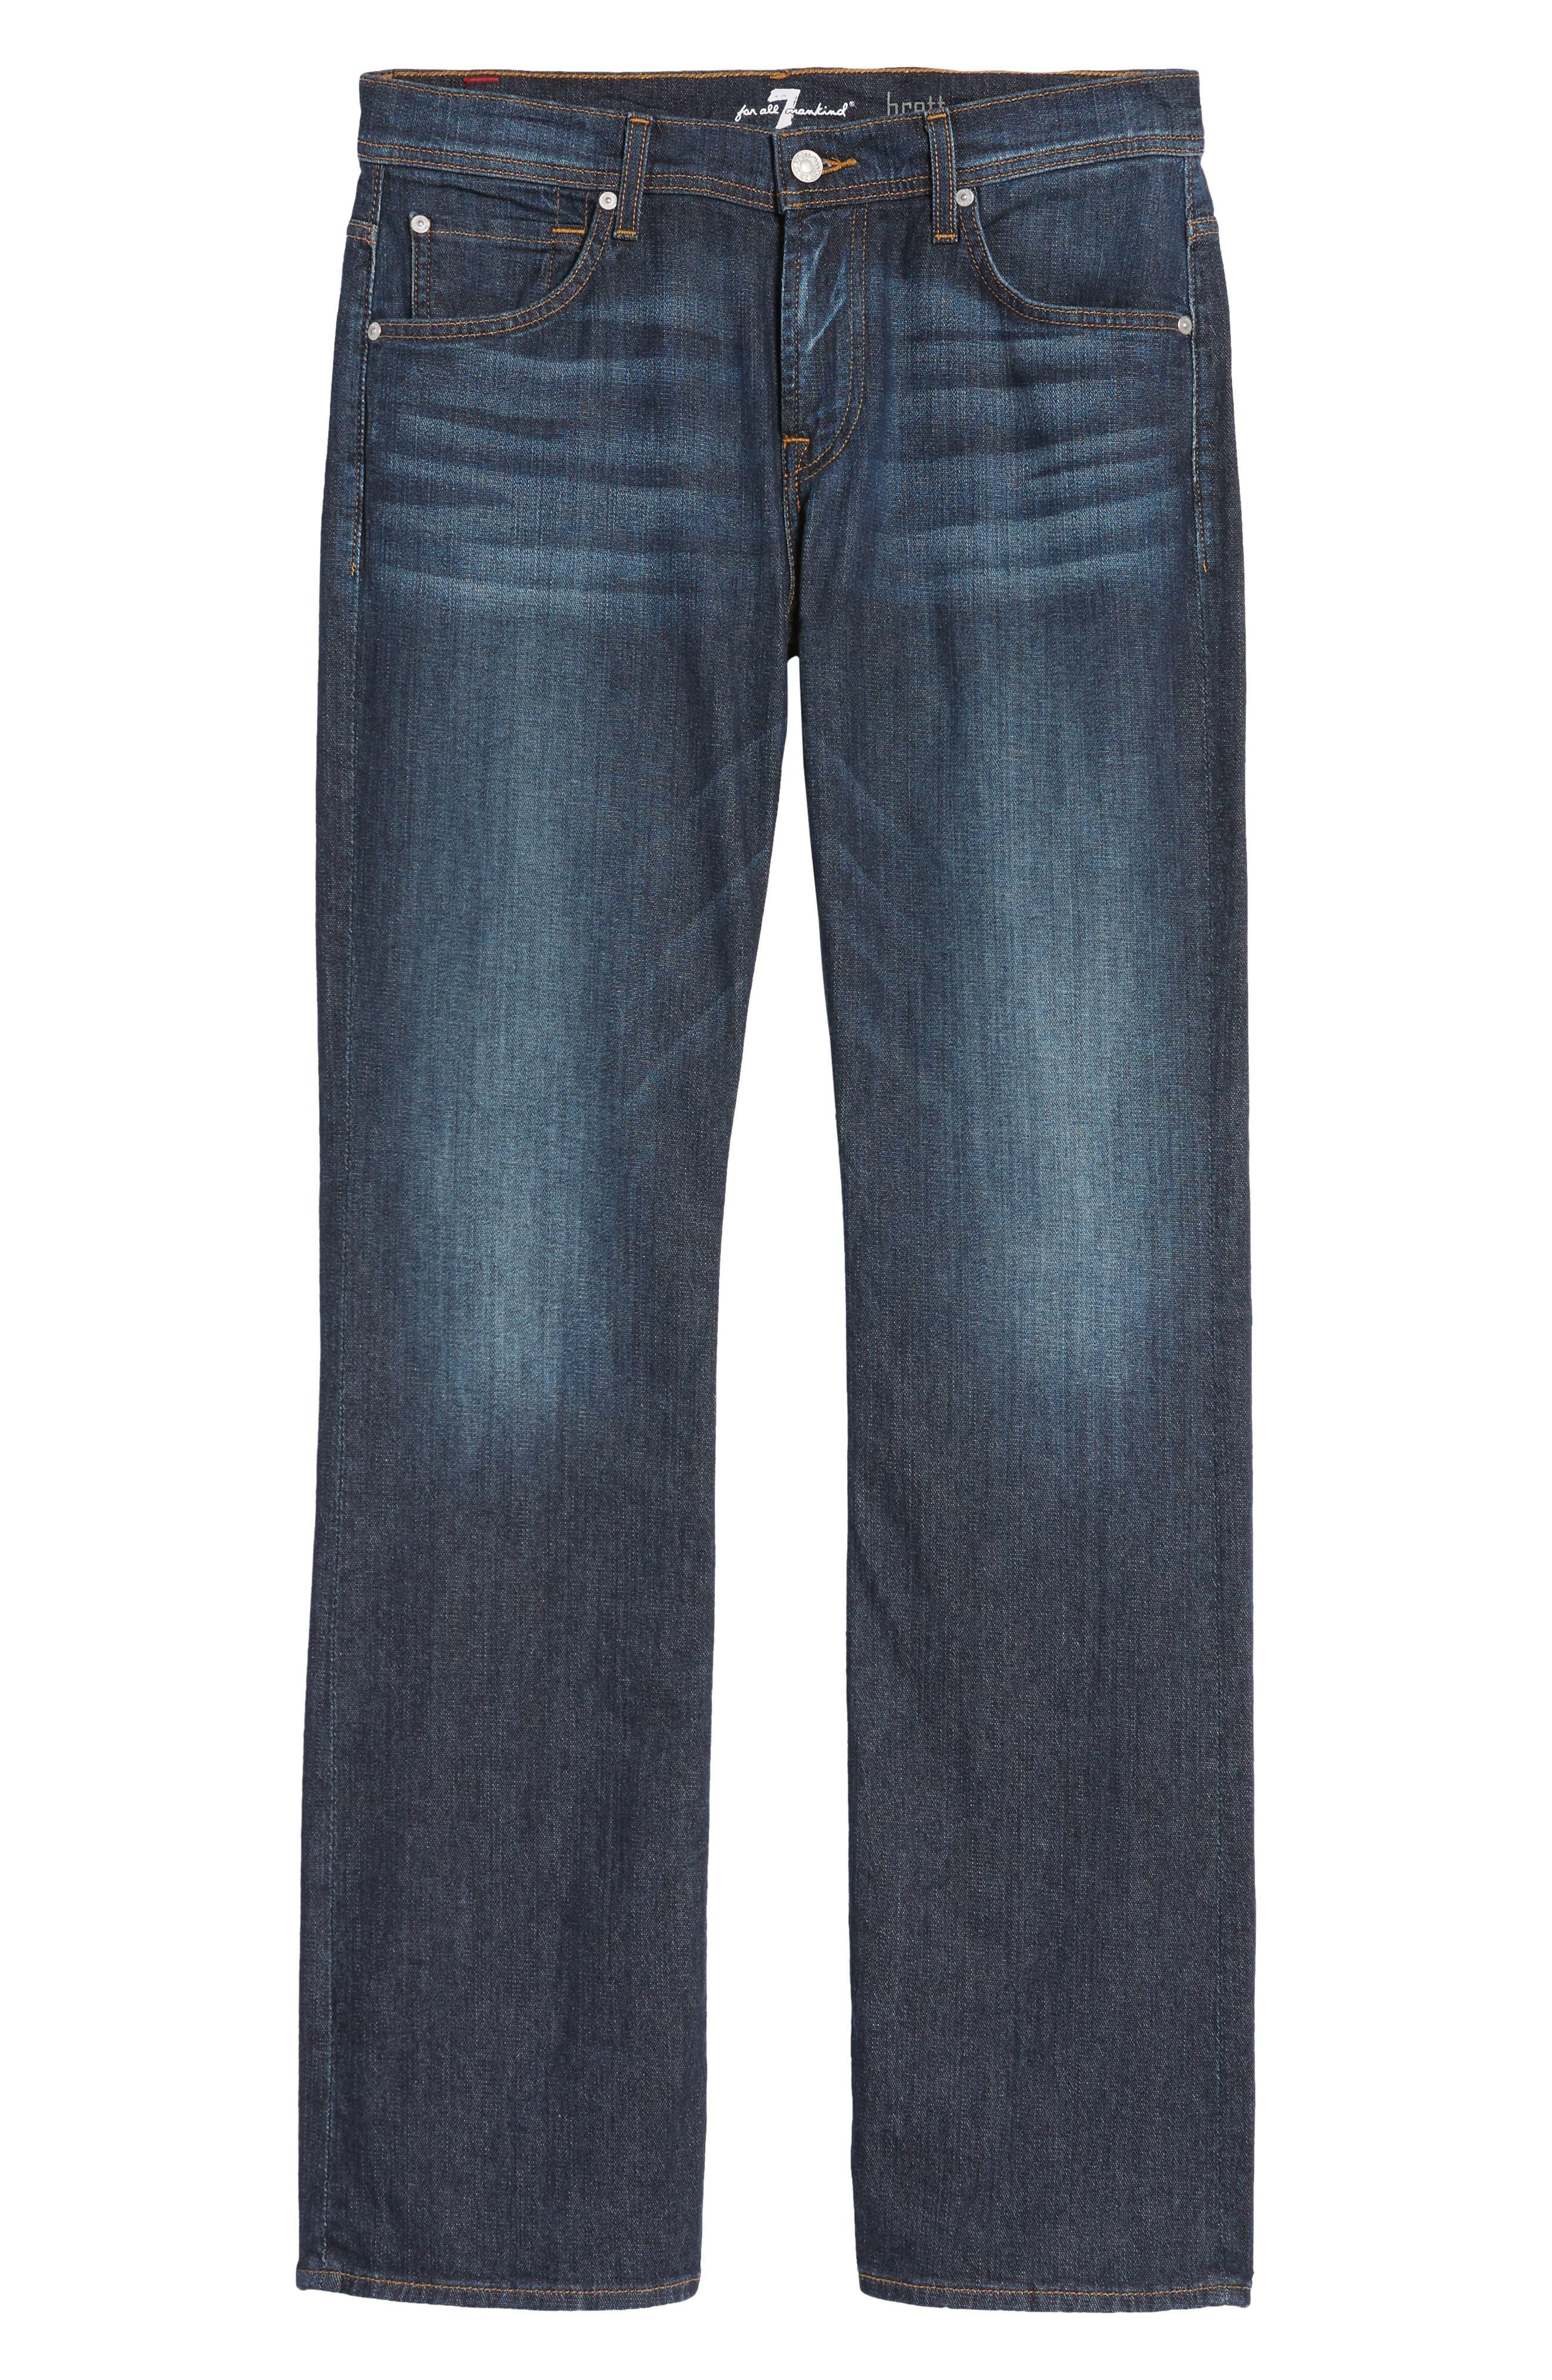 Brett Bootcut Jeans,                             Alternate thumbnail 6, color,                             402